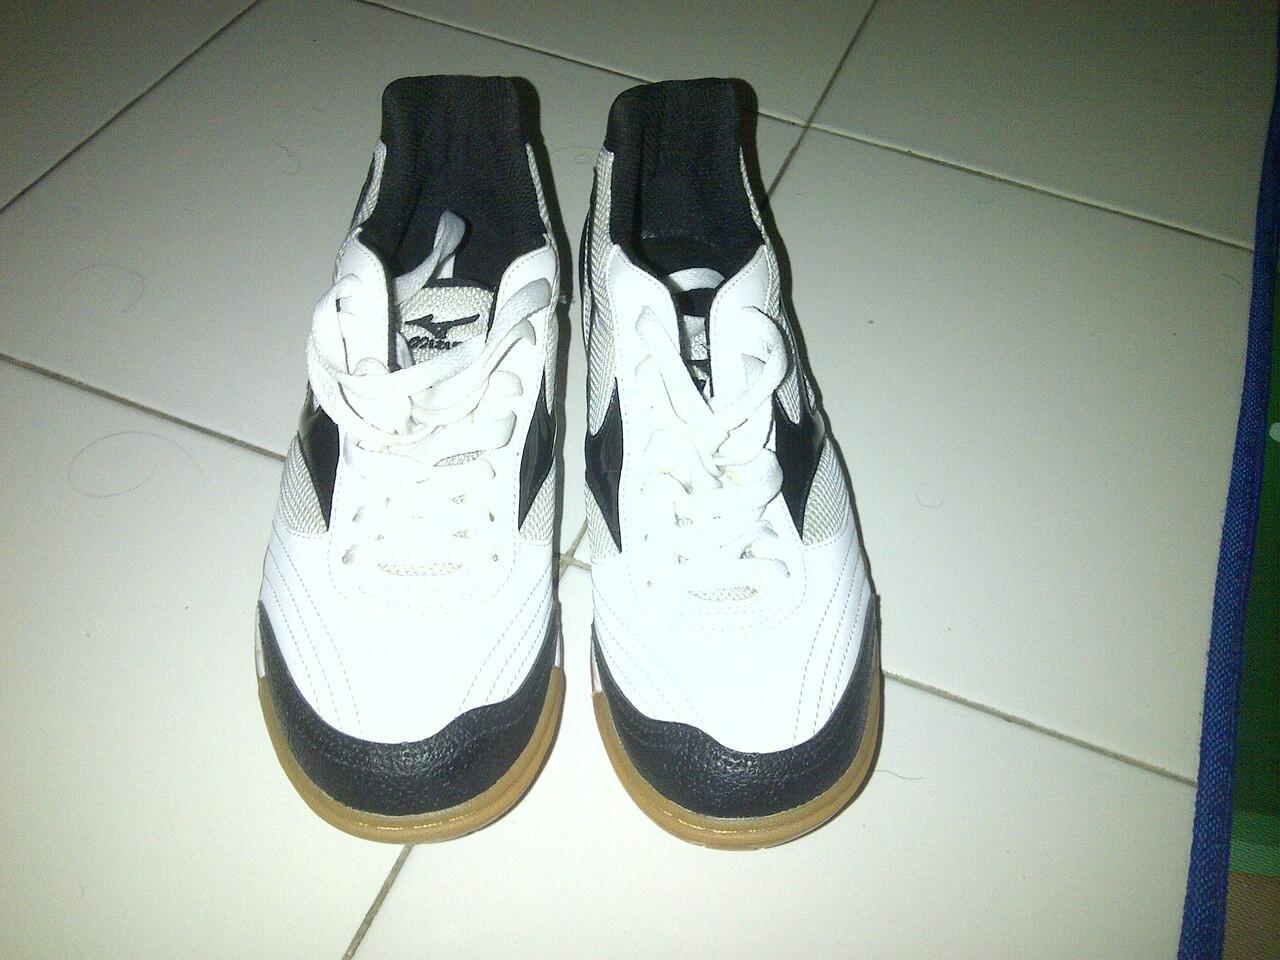 Jual Sepatu Mizuno Sala Size 41